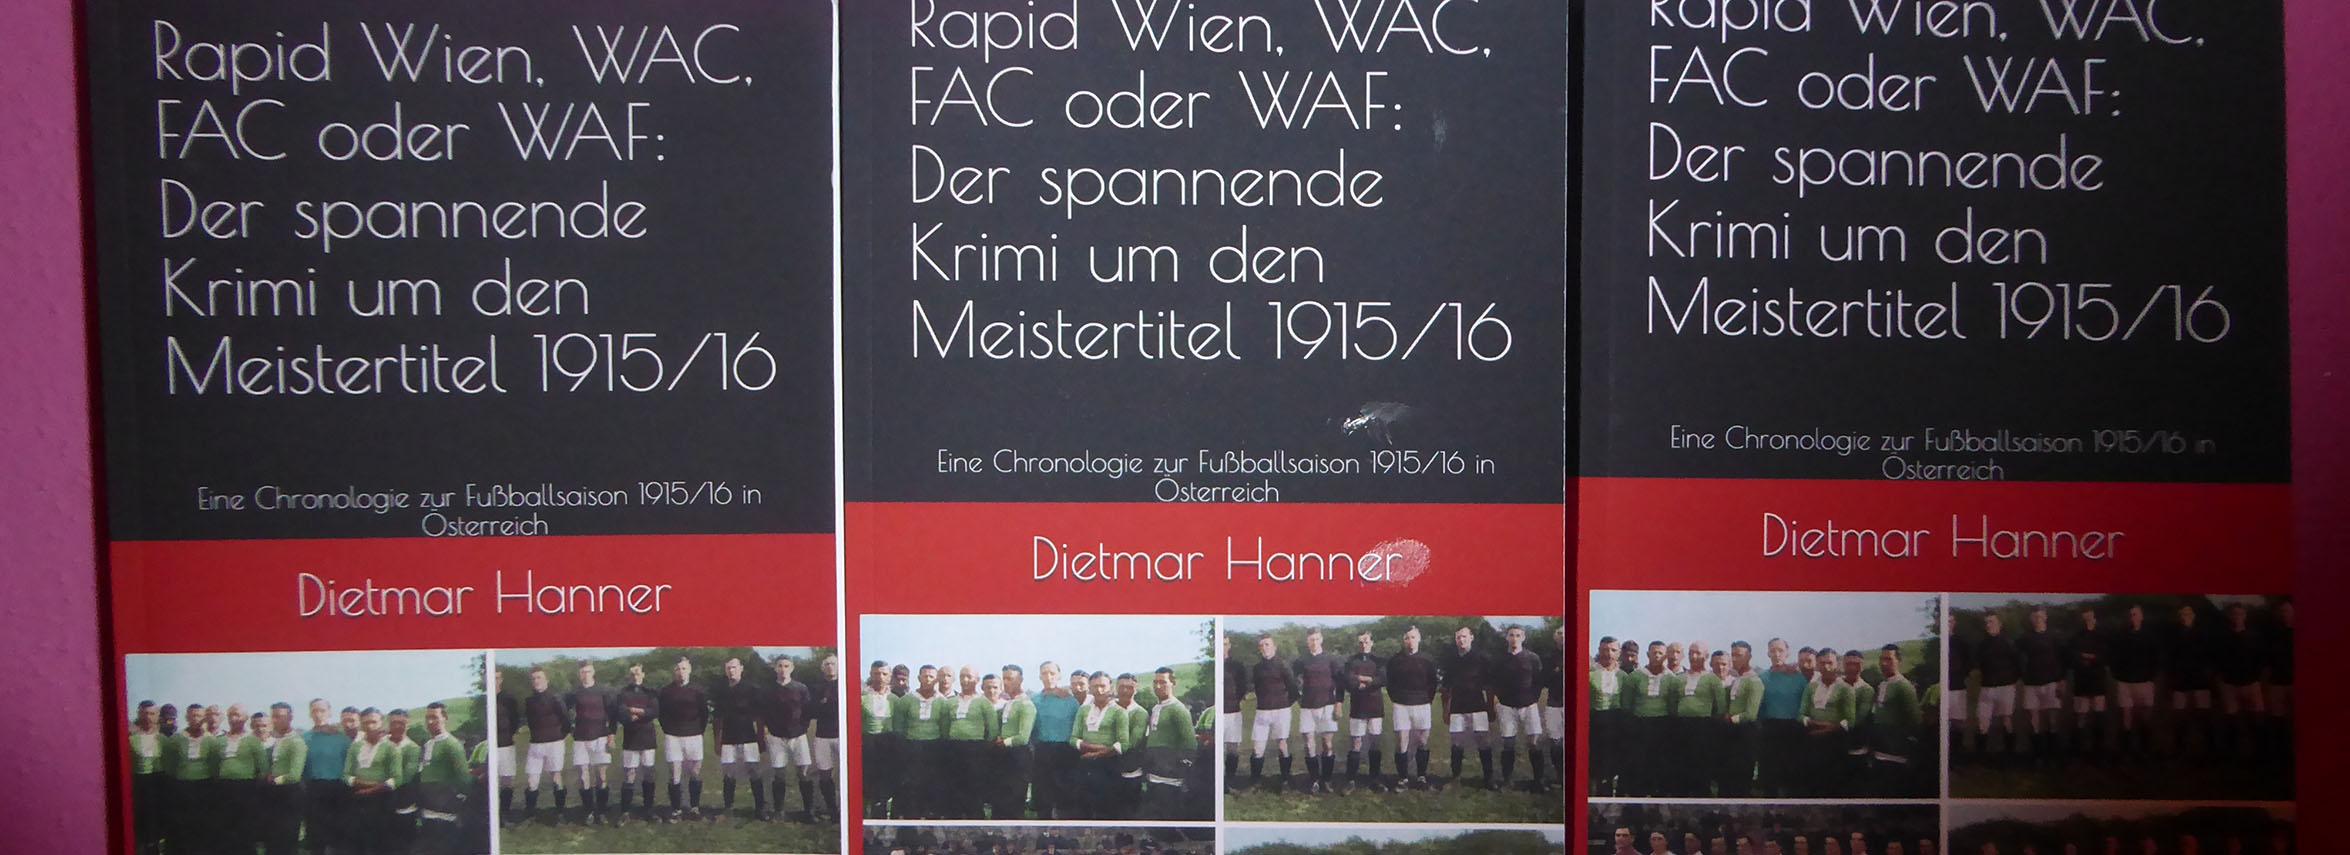 Rapid Wien, WAC, FAC oder WAF